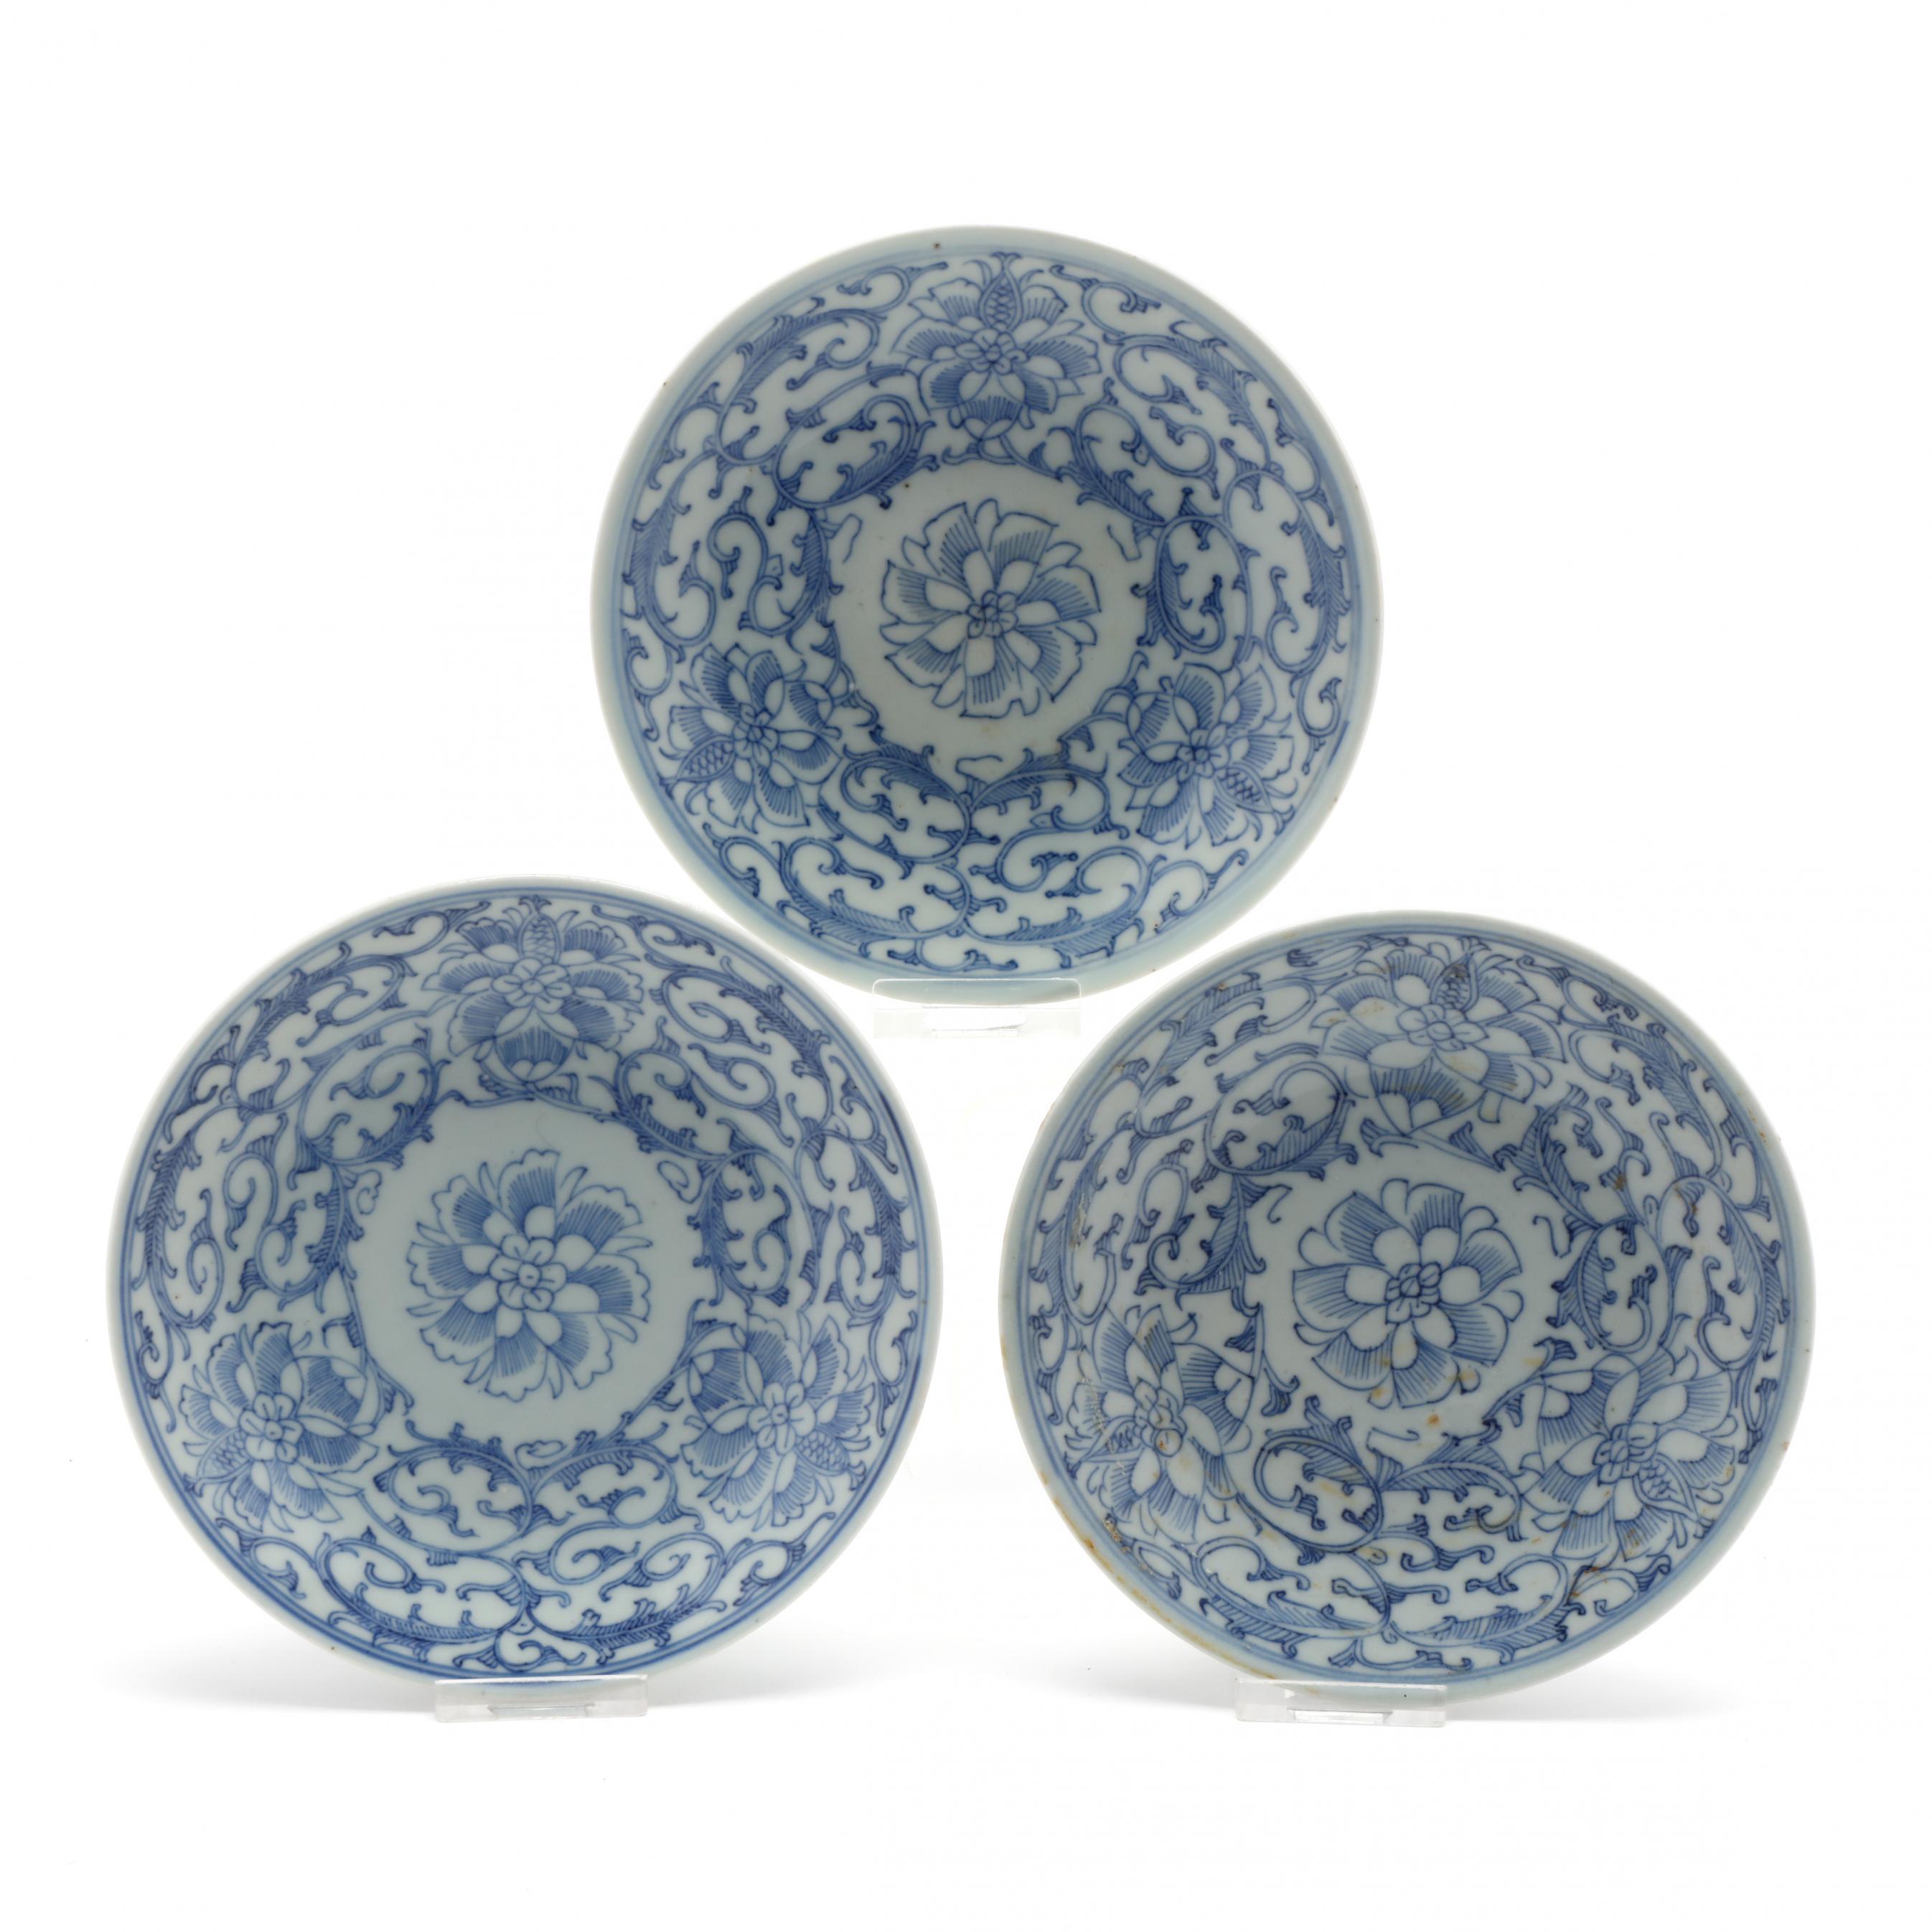 three-chinese-tao-kuang-period-small-plates